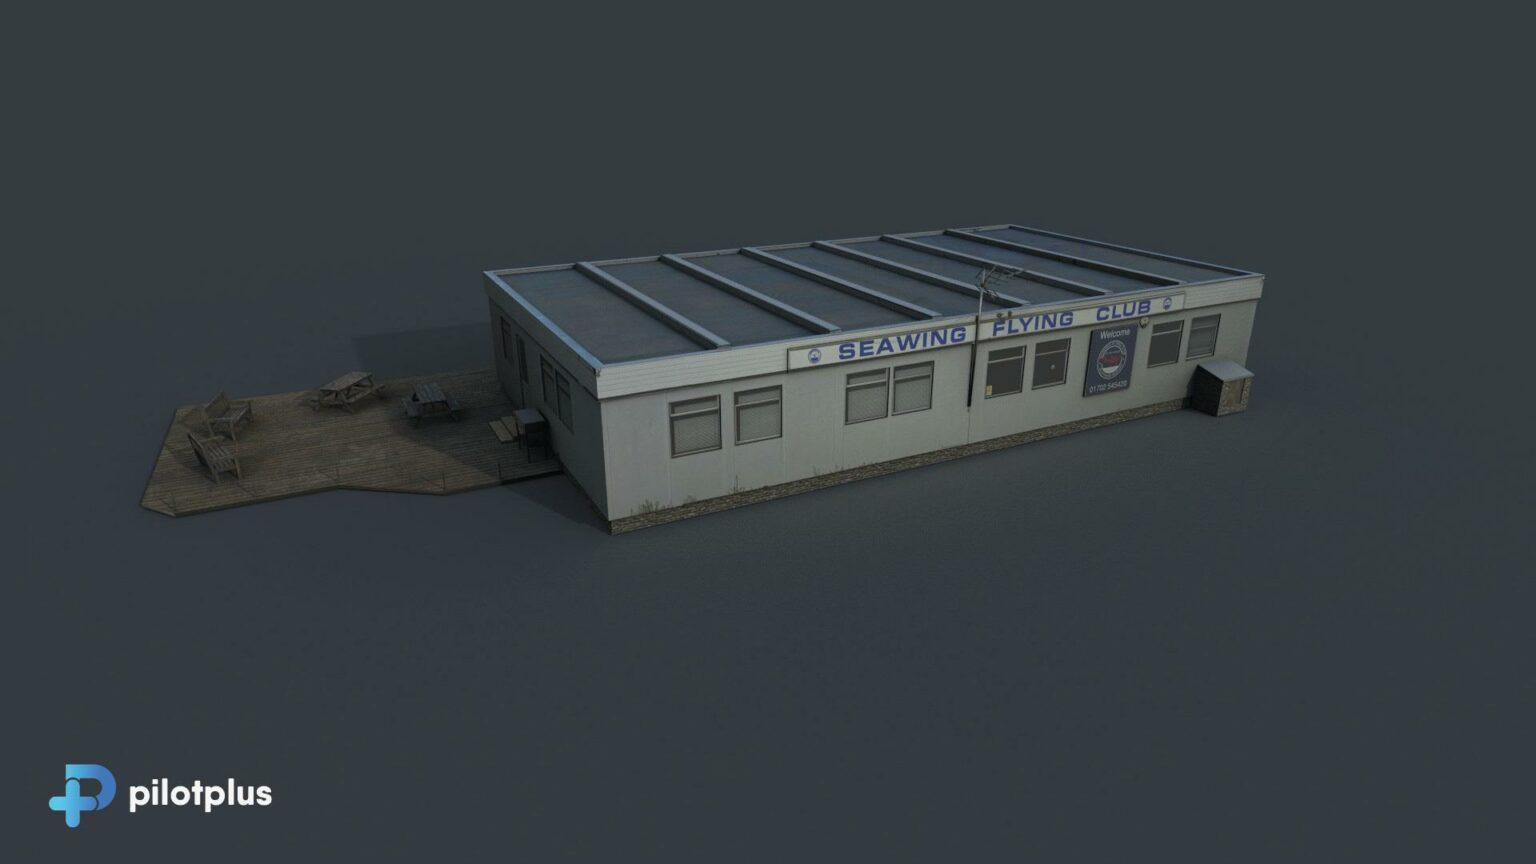 pilotplus_Southend (4)